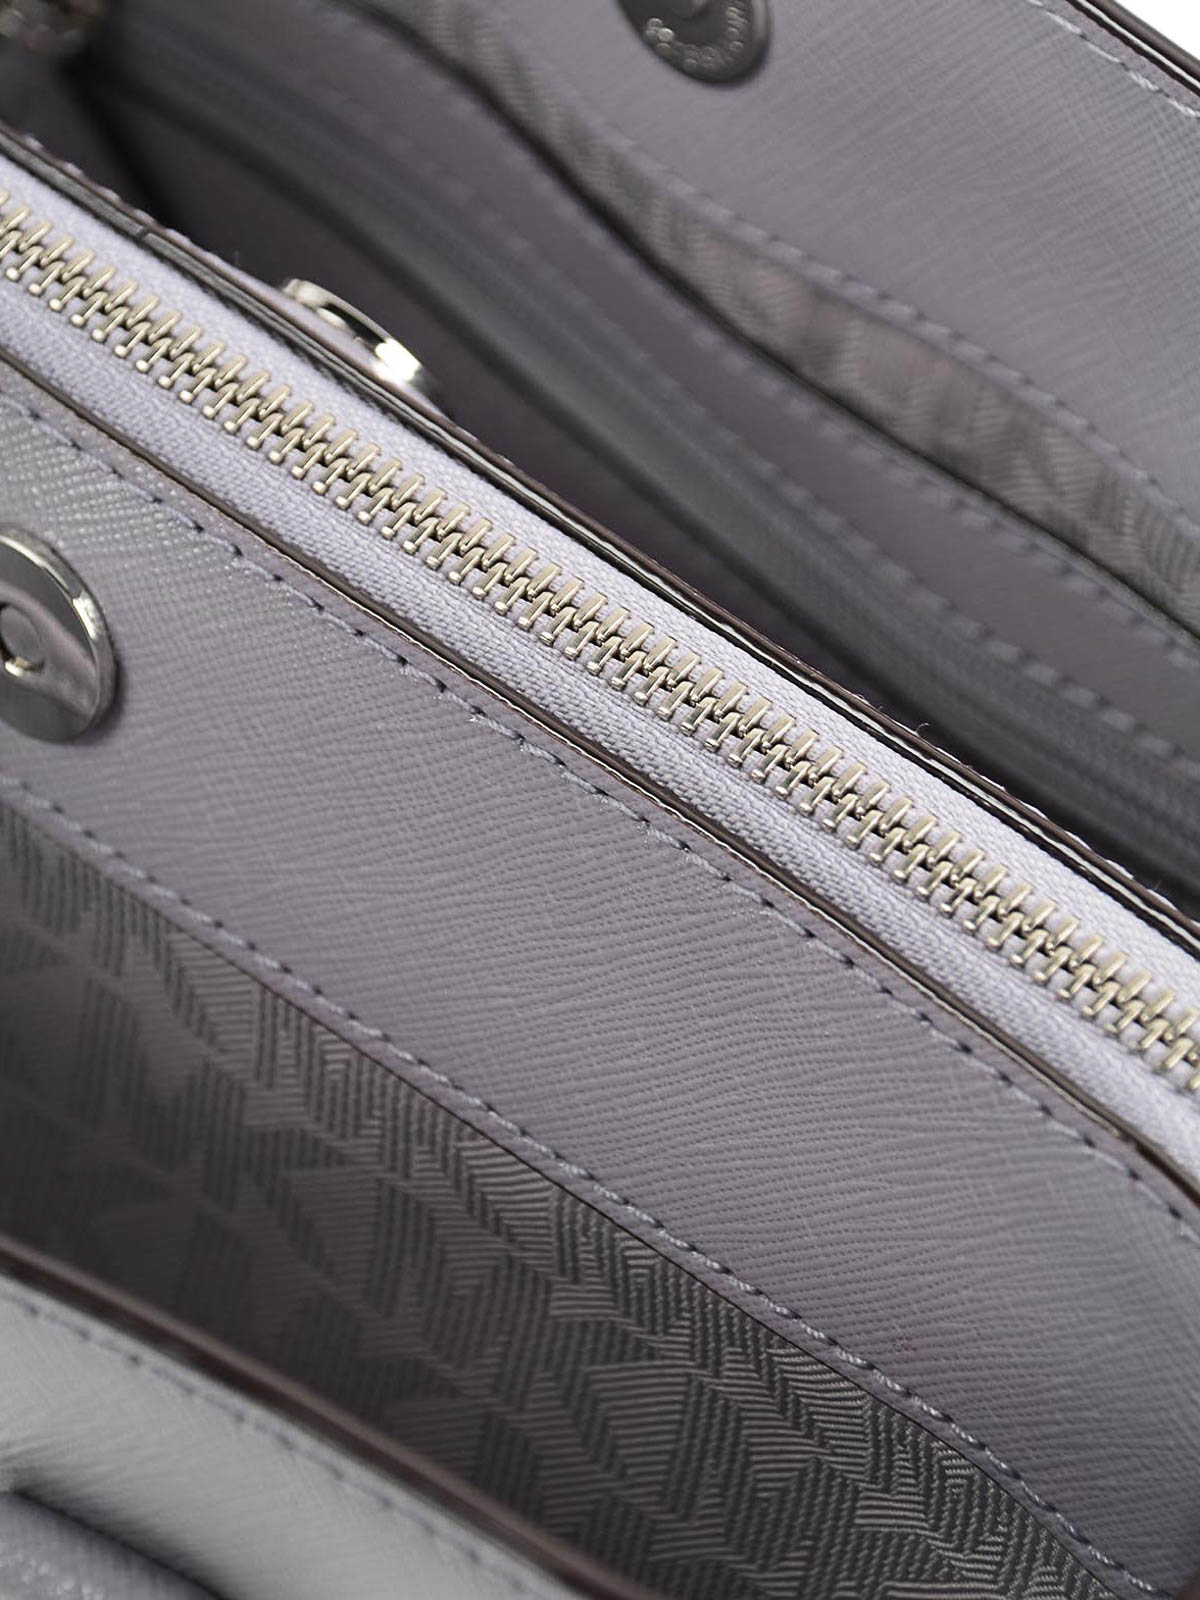 0d3eb6a5a210 MICHAEL KORS buy online Savannah medium satchel. MICHAEL KORS: totes bags  ...